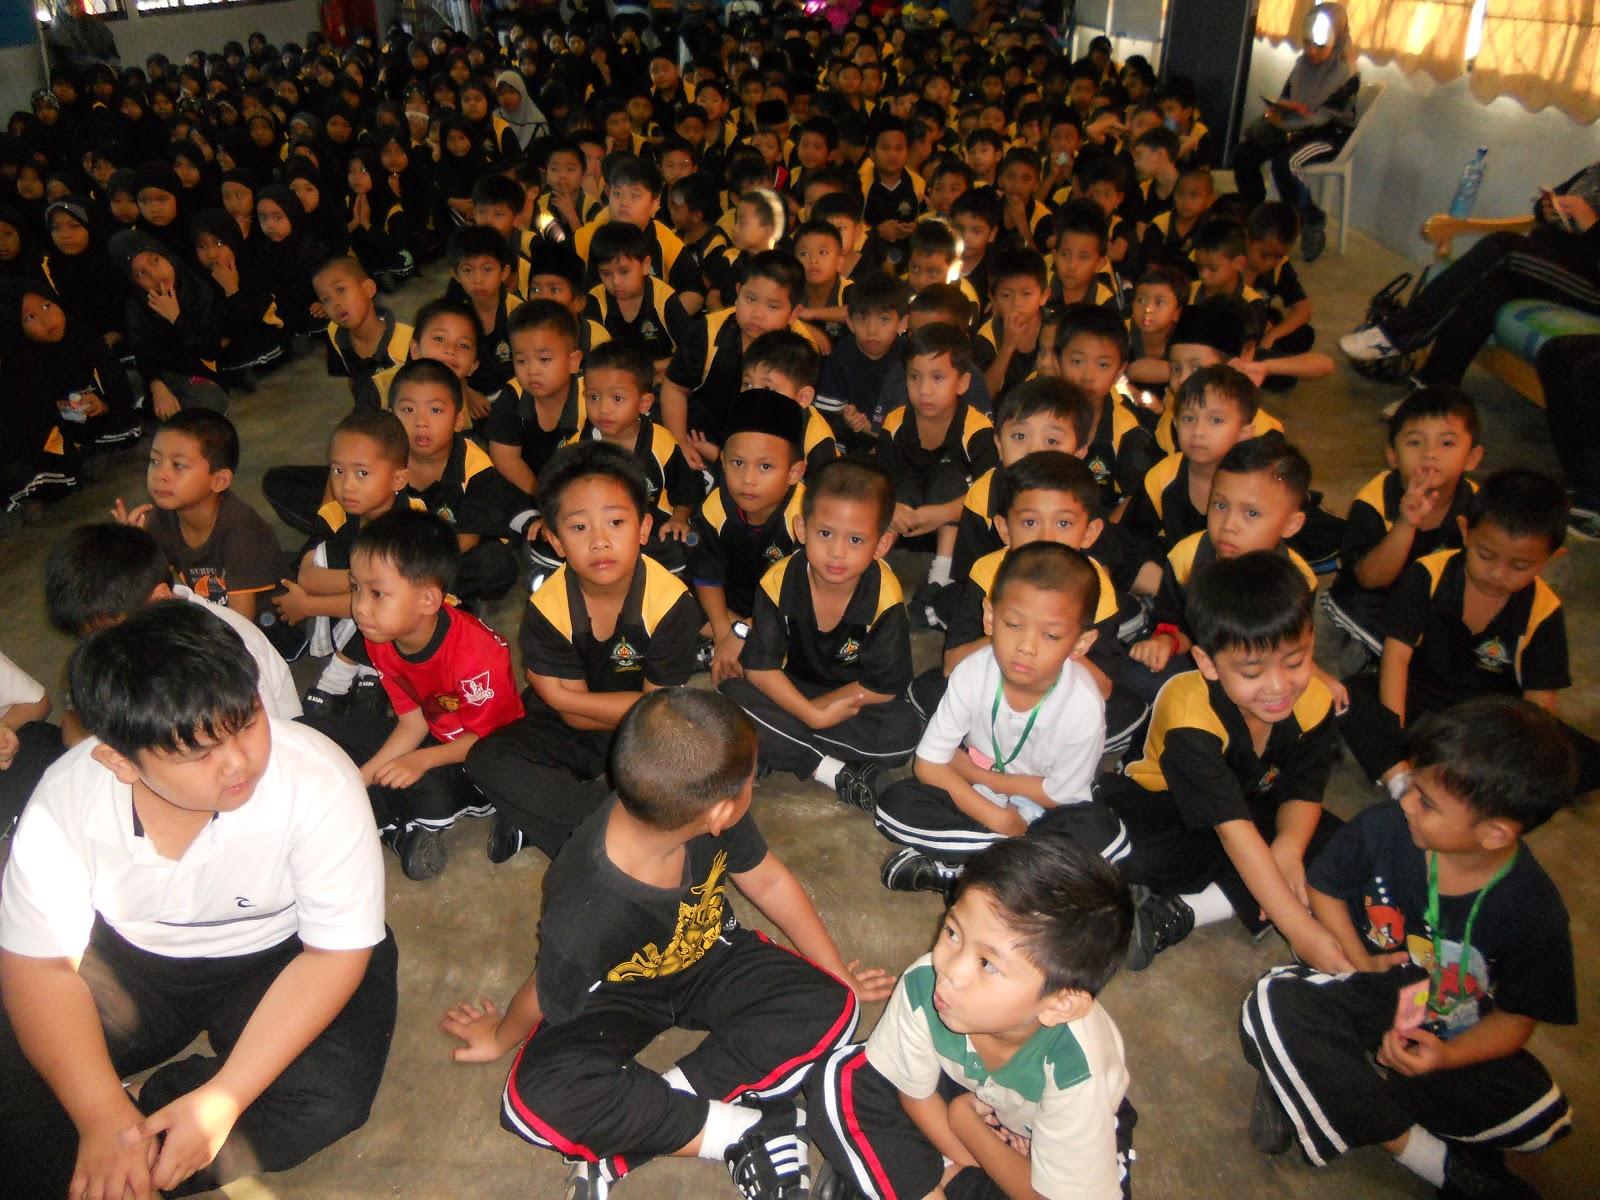 calendar brunei school holiday 2013 | just b.CAUSE